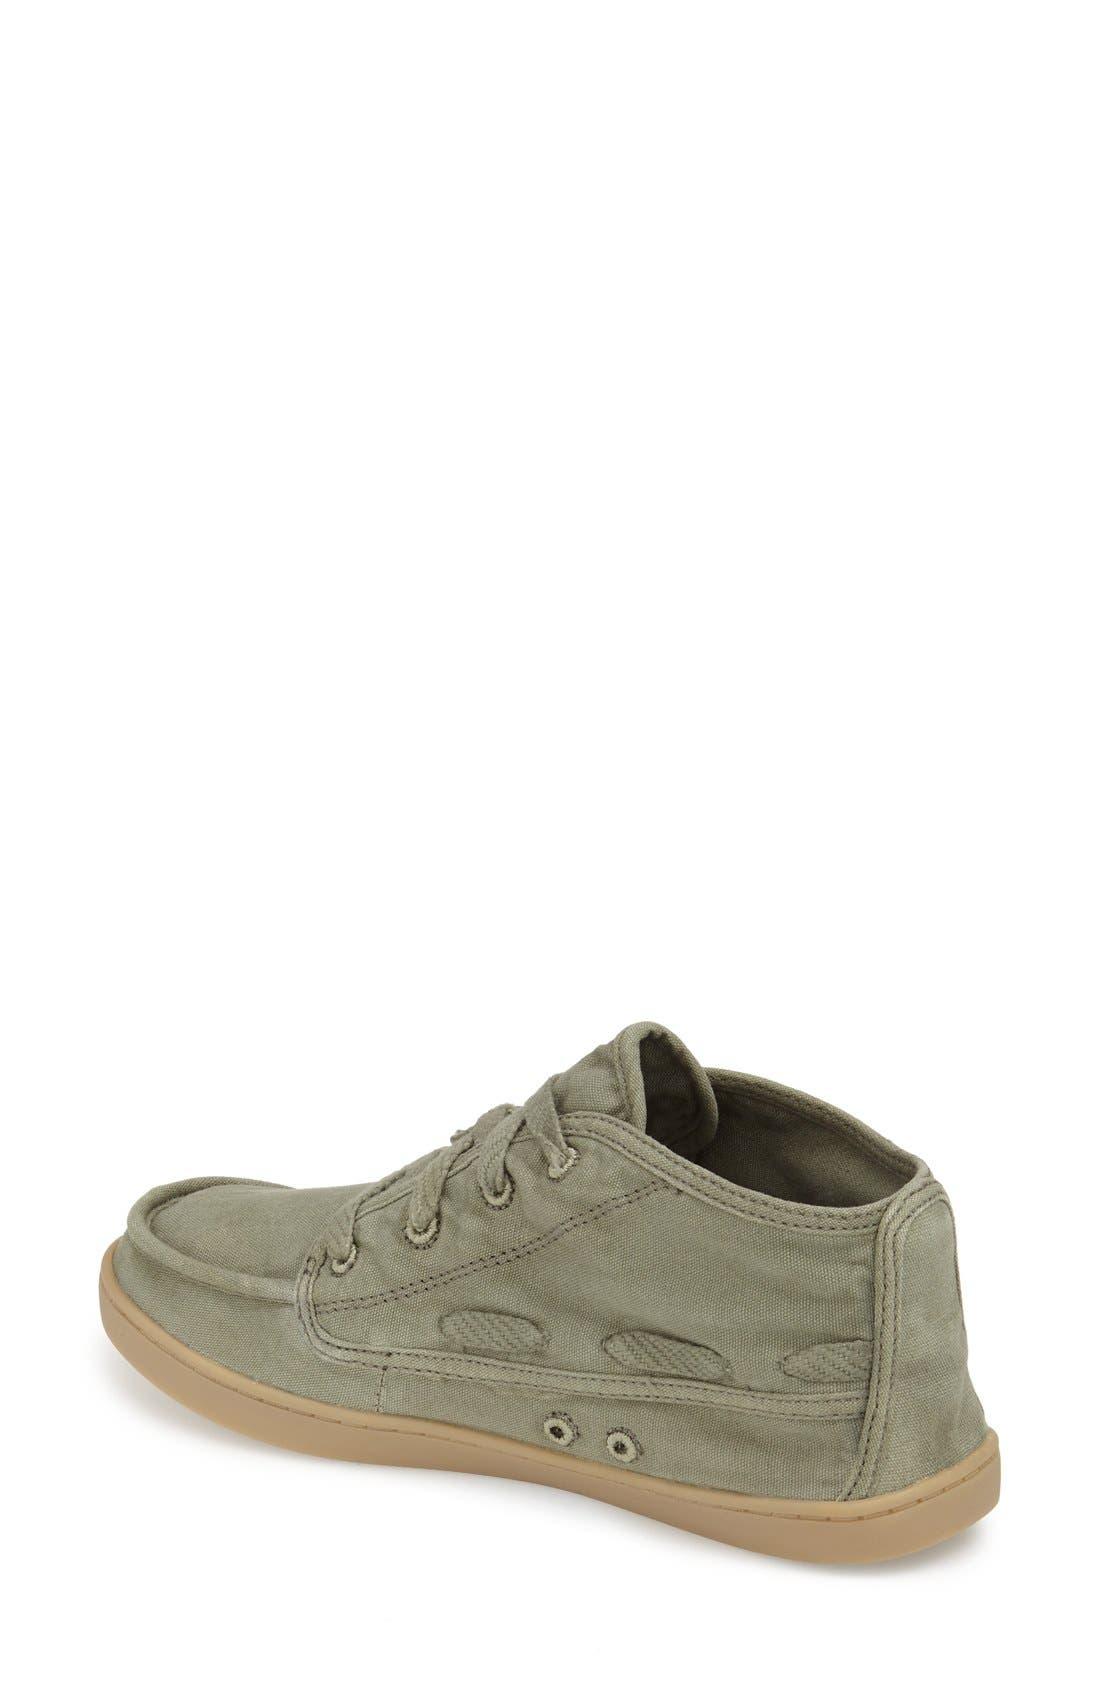 'Vee K Shawn' High Top Sneaker,                             Alternate thumbnail 6, color,